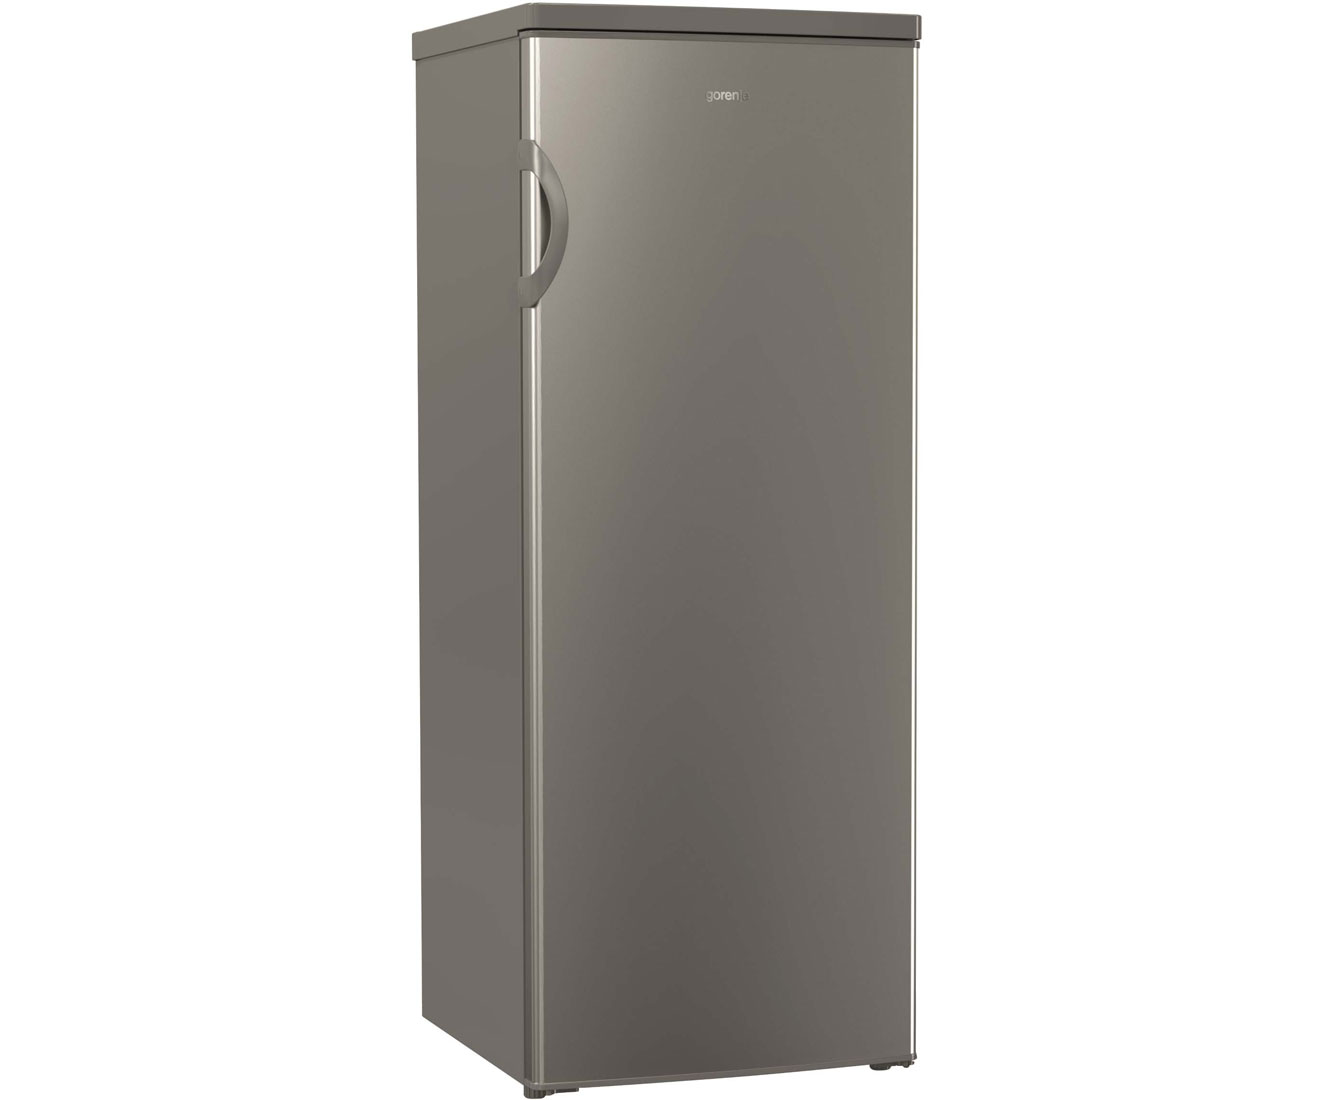 Gorenje Kühlschrank In Betrieb Nehmen : Gorenje rb anx kühlschrank edelstahl optik a